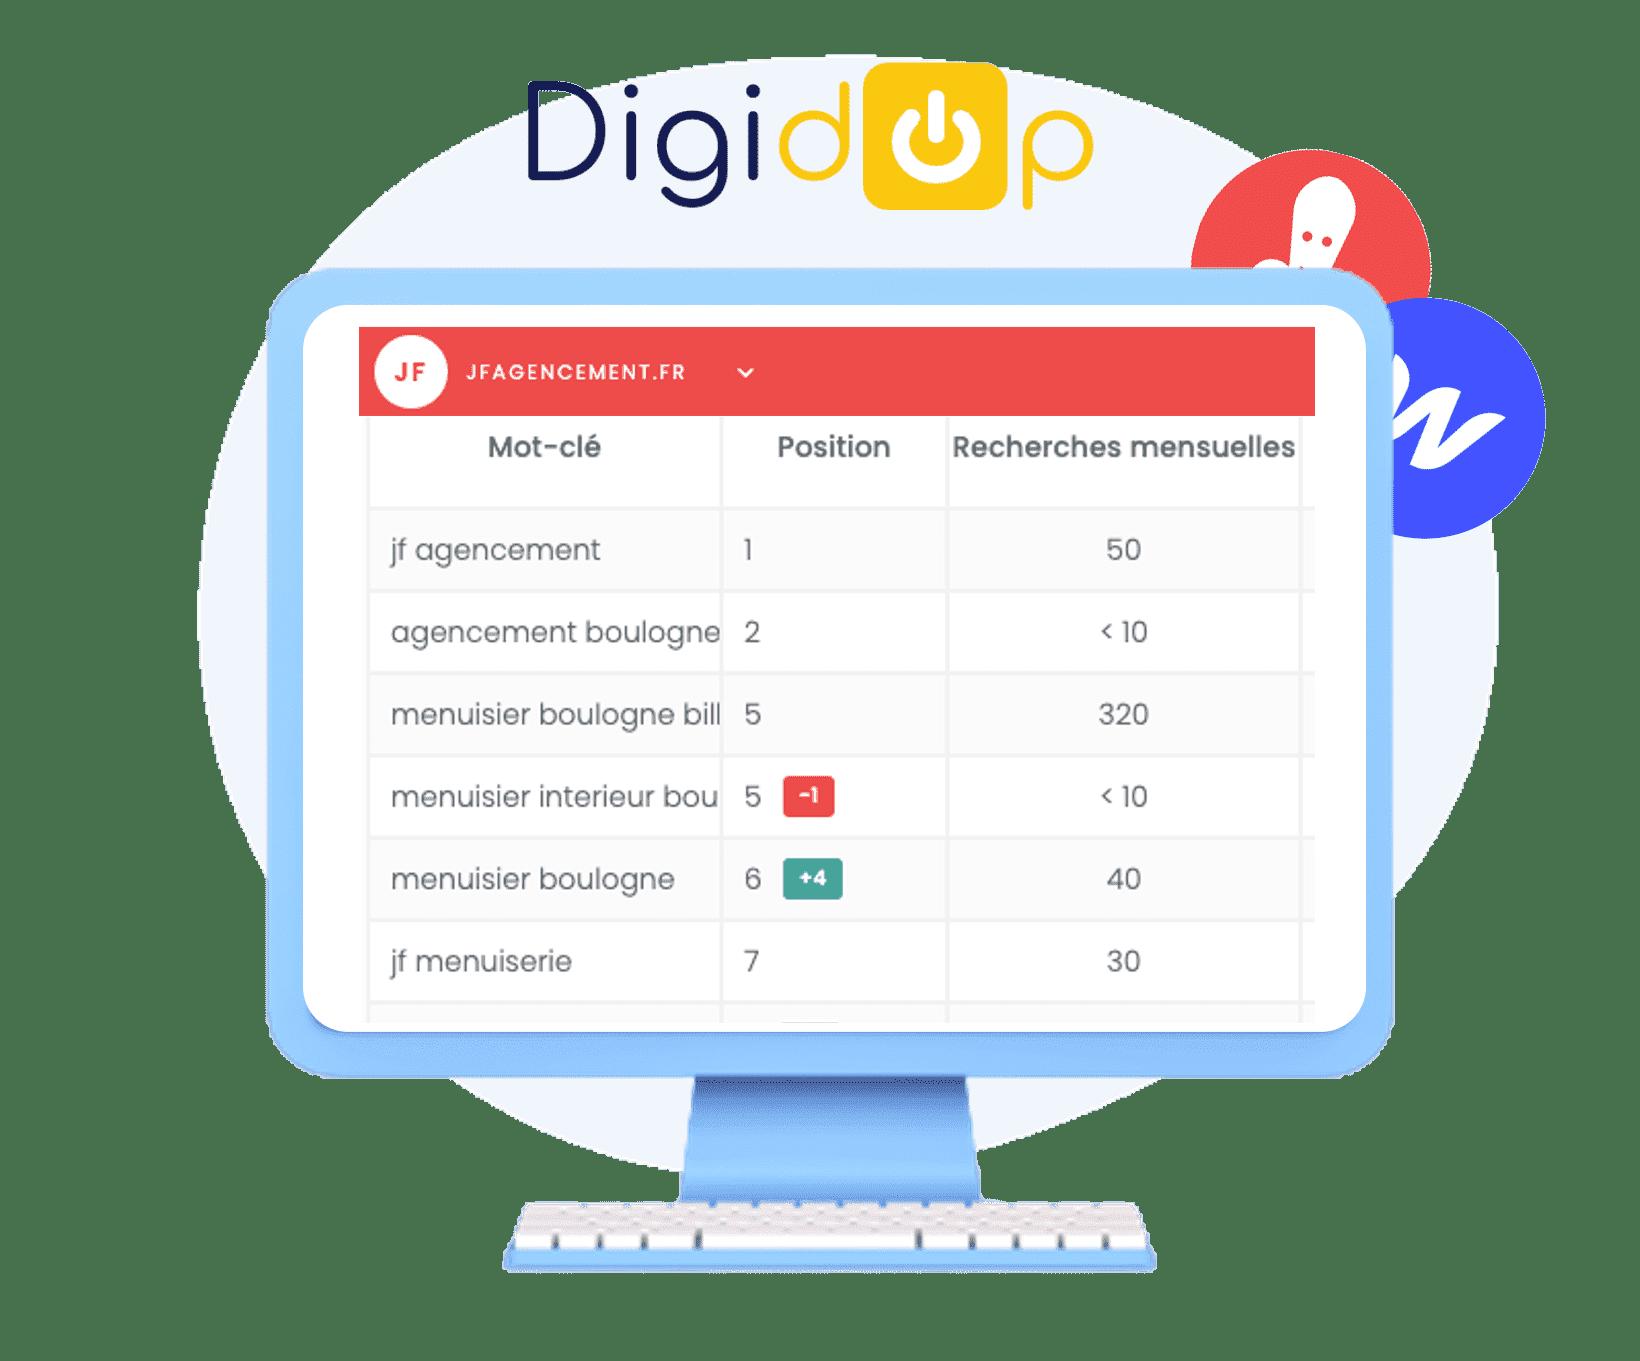 ranking-keyword-jfagencement-webflow-x-octopulse-x-digidop